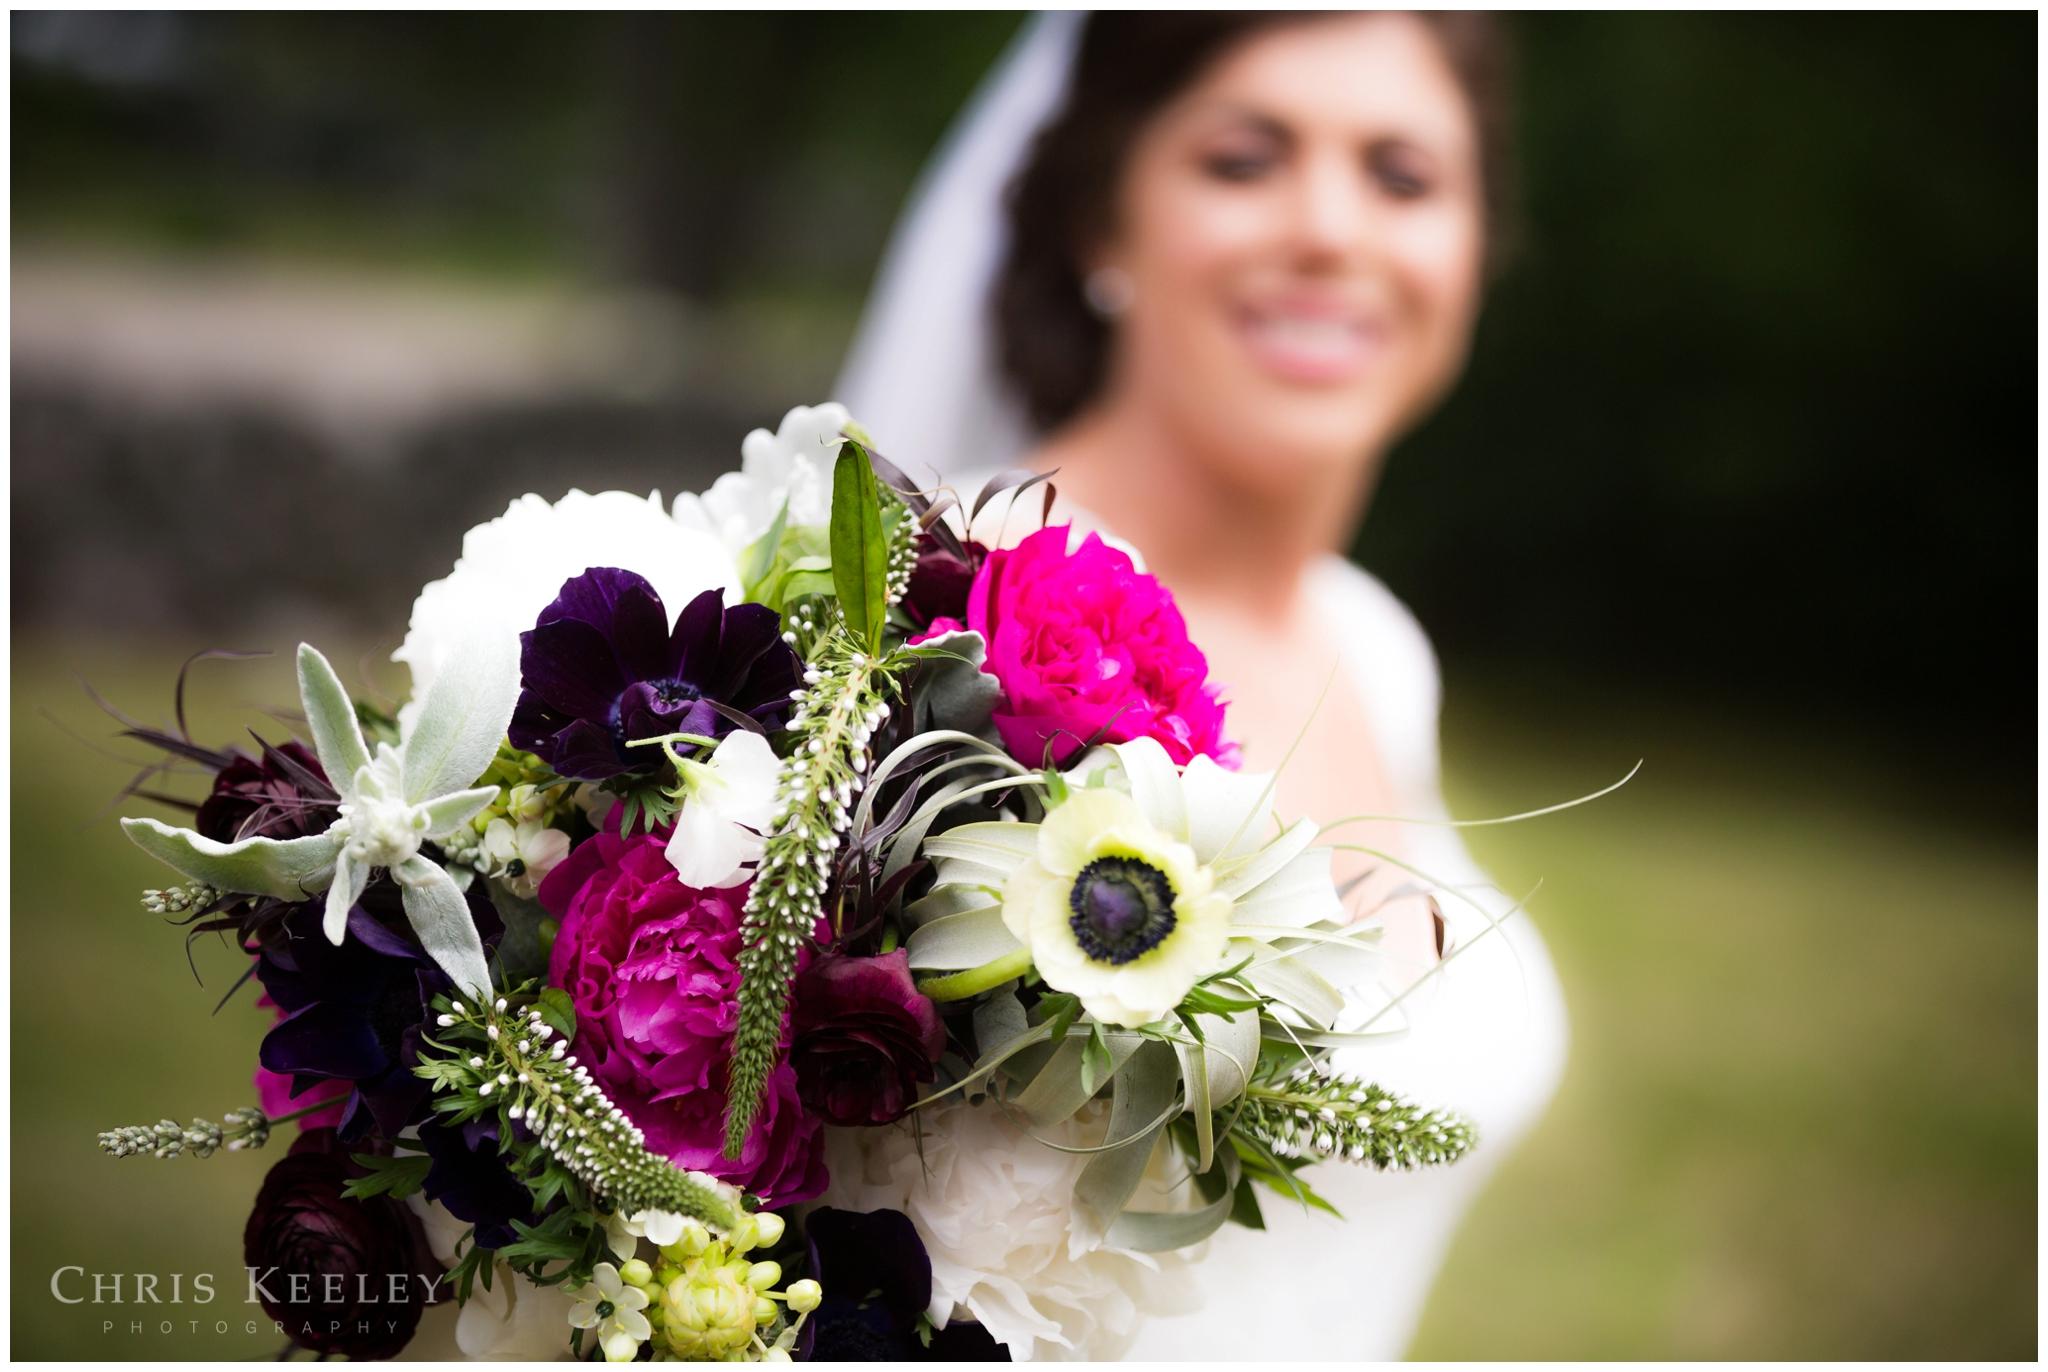 burrows-new-hampshire-wedding-photographer-chris-keeley-19.jpg